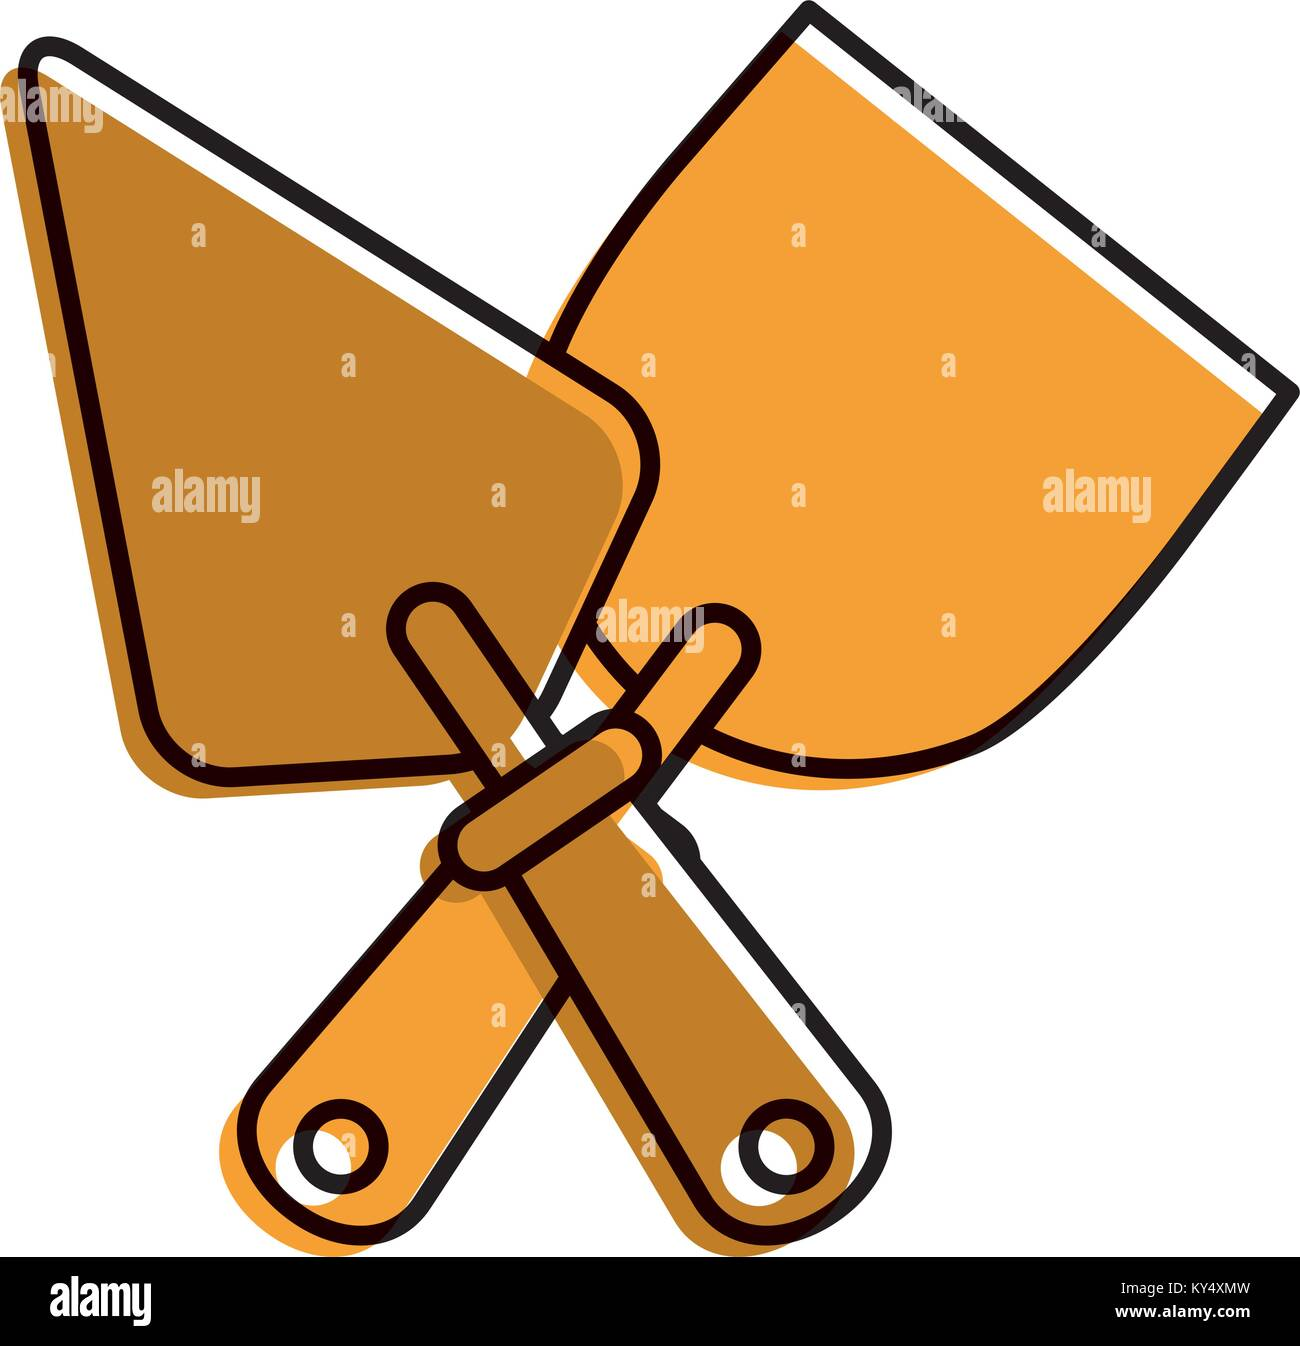 Garage Tools Clipart - Toolbox Equipment Clip Art - Home Repair - Free SVG  on Request in 2020 | Tool box, Clip art, Home repair